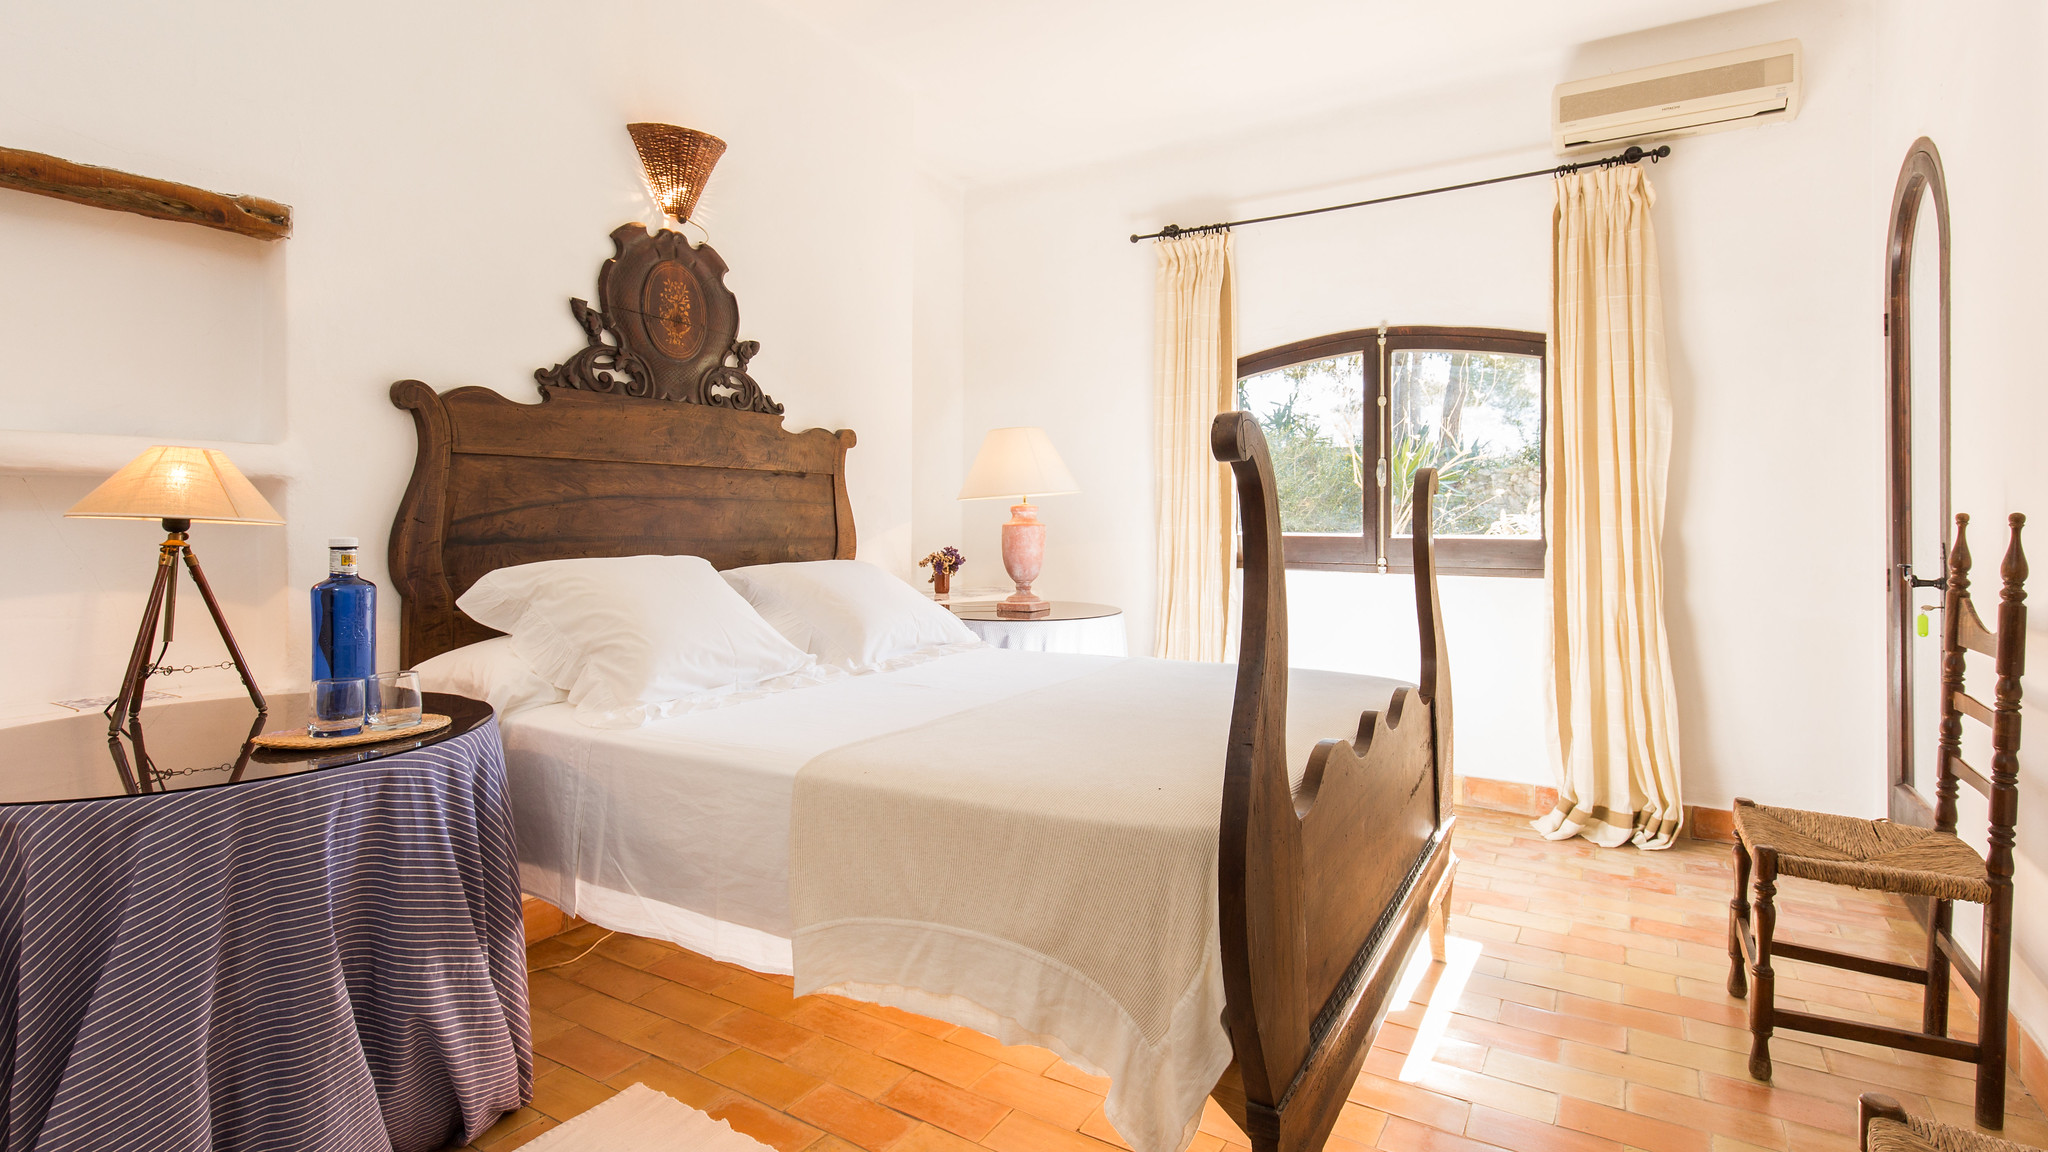 https://www.white-ibiza.com/wp-content/uploads/2020/05/white-ibiza-villas-can-amelida-interior-bedroom3.jpg